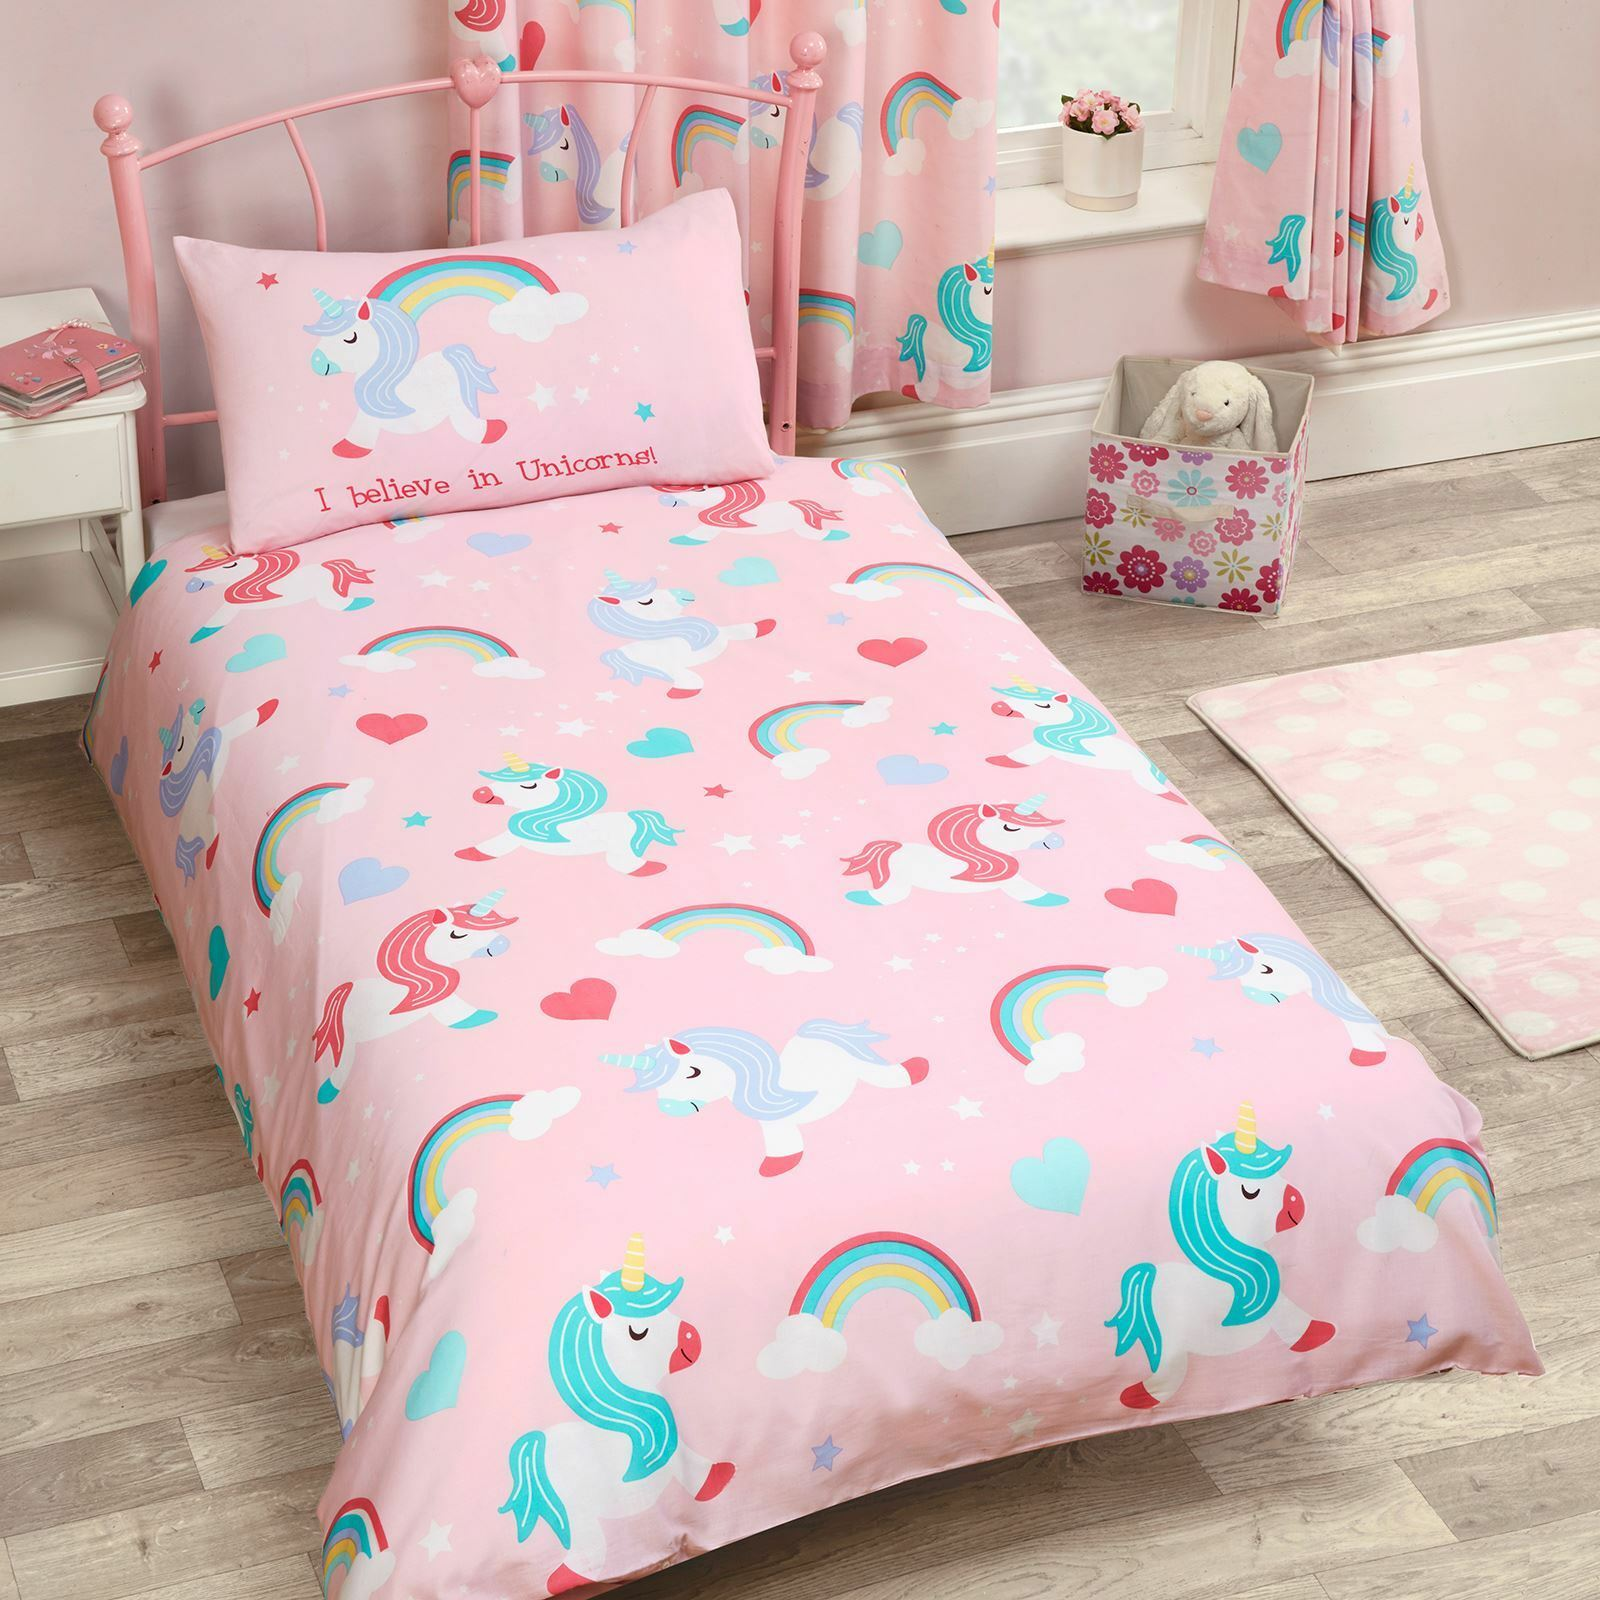 bed single images unicorn set duvet bedding itm double kids quilt linnlive cover duckegg com